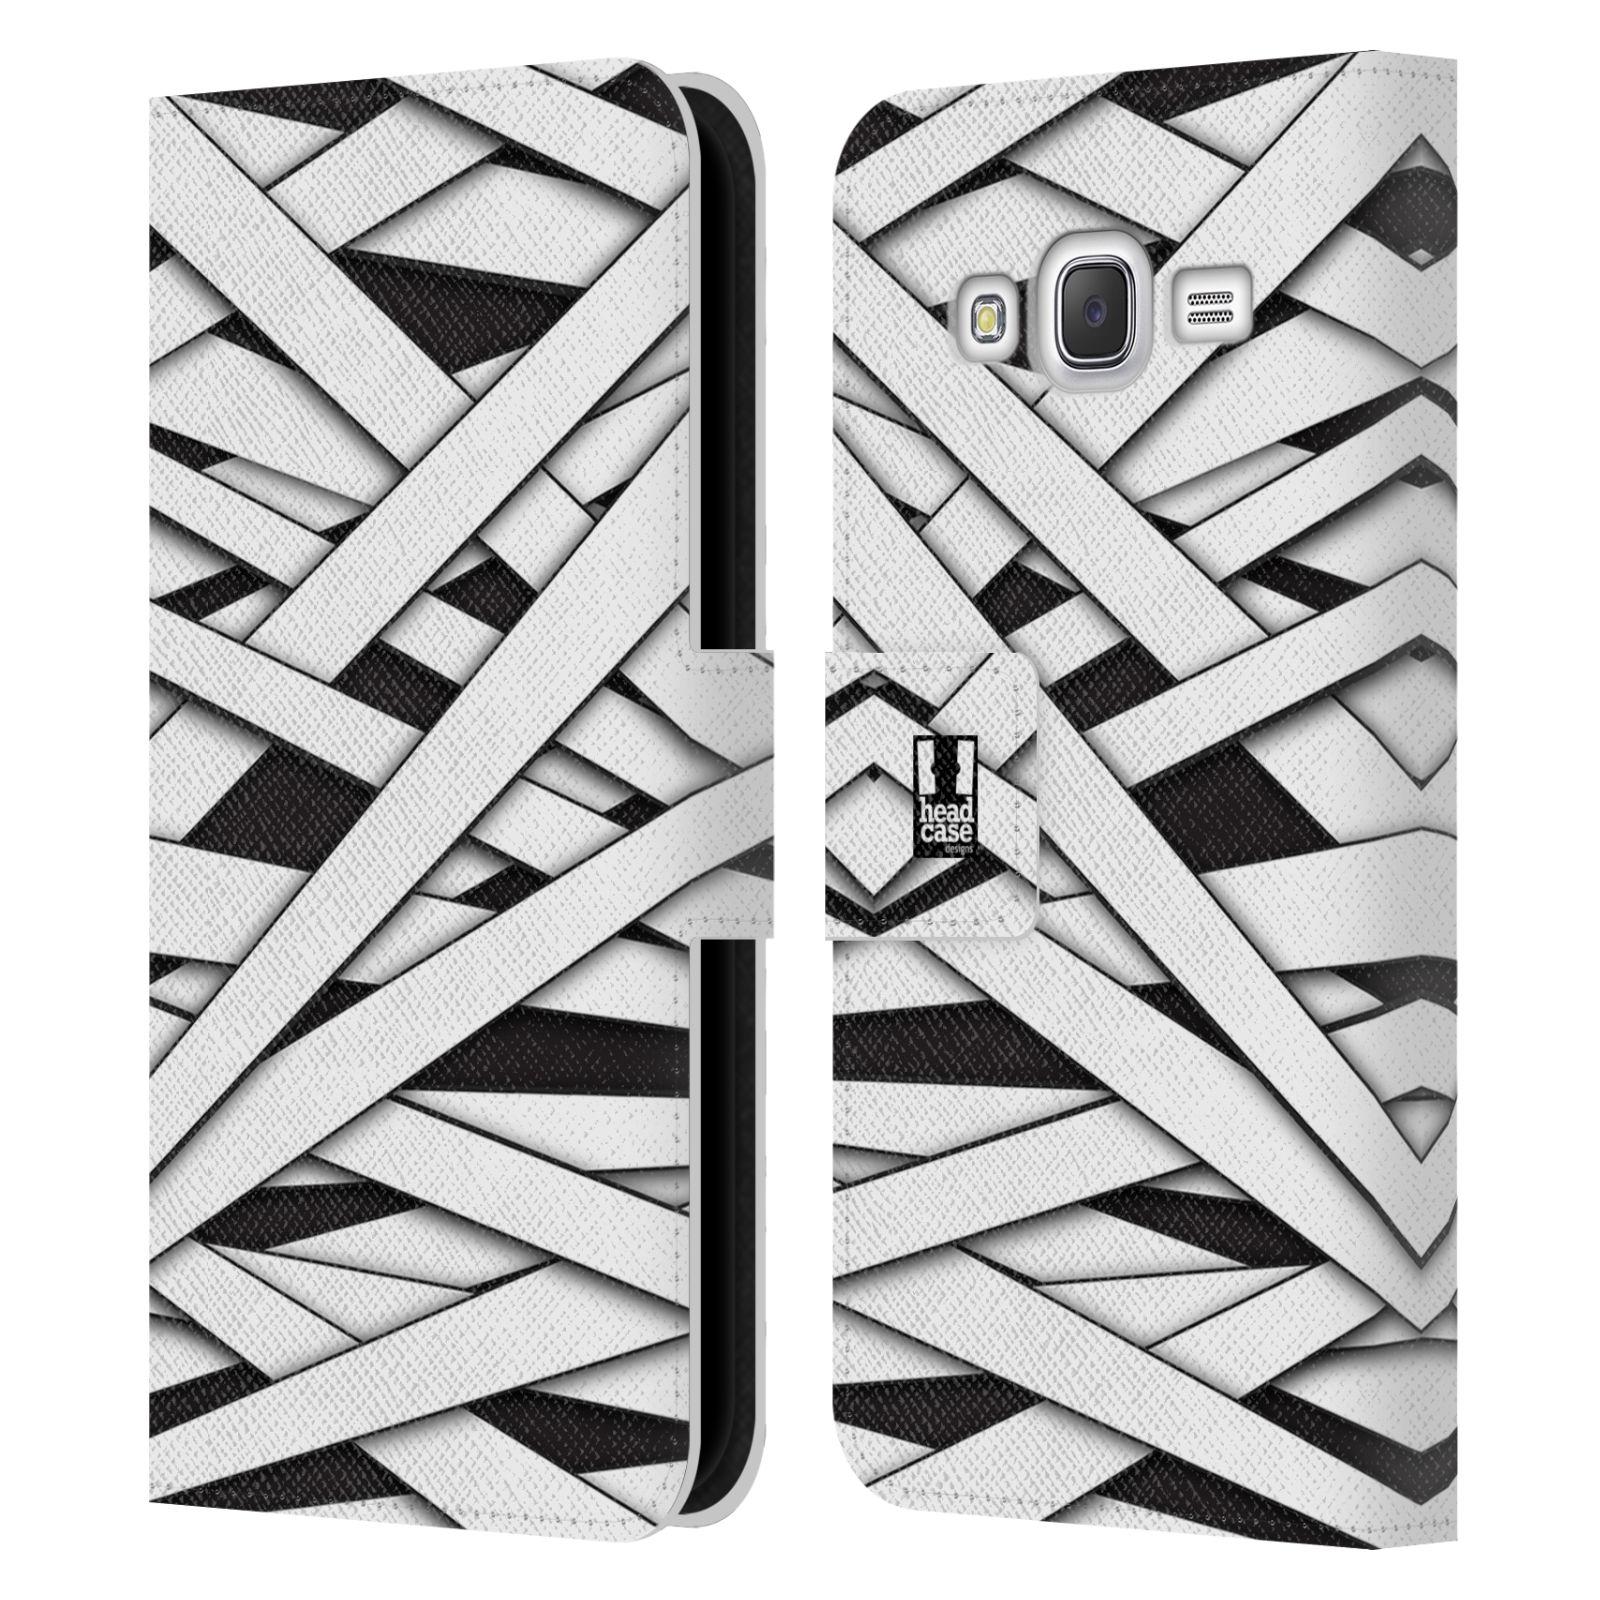 HEAD CASE Flipové pouzdro pro mobil Samsung Galaxy J5 (J500) / J5 DUOS barevná mumie proužky černá a bílá